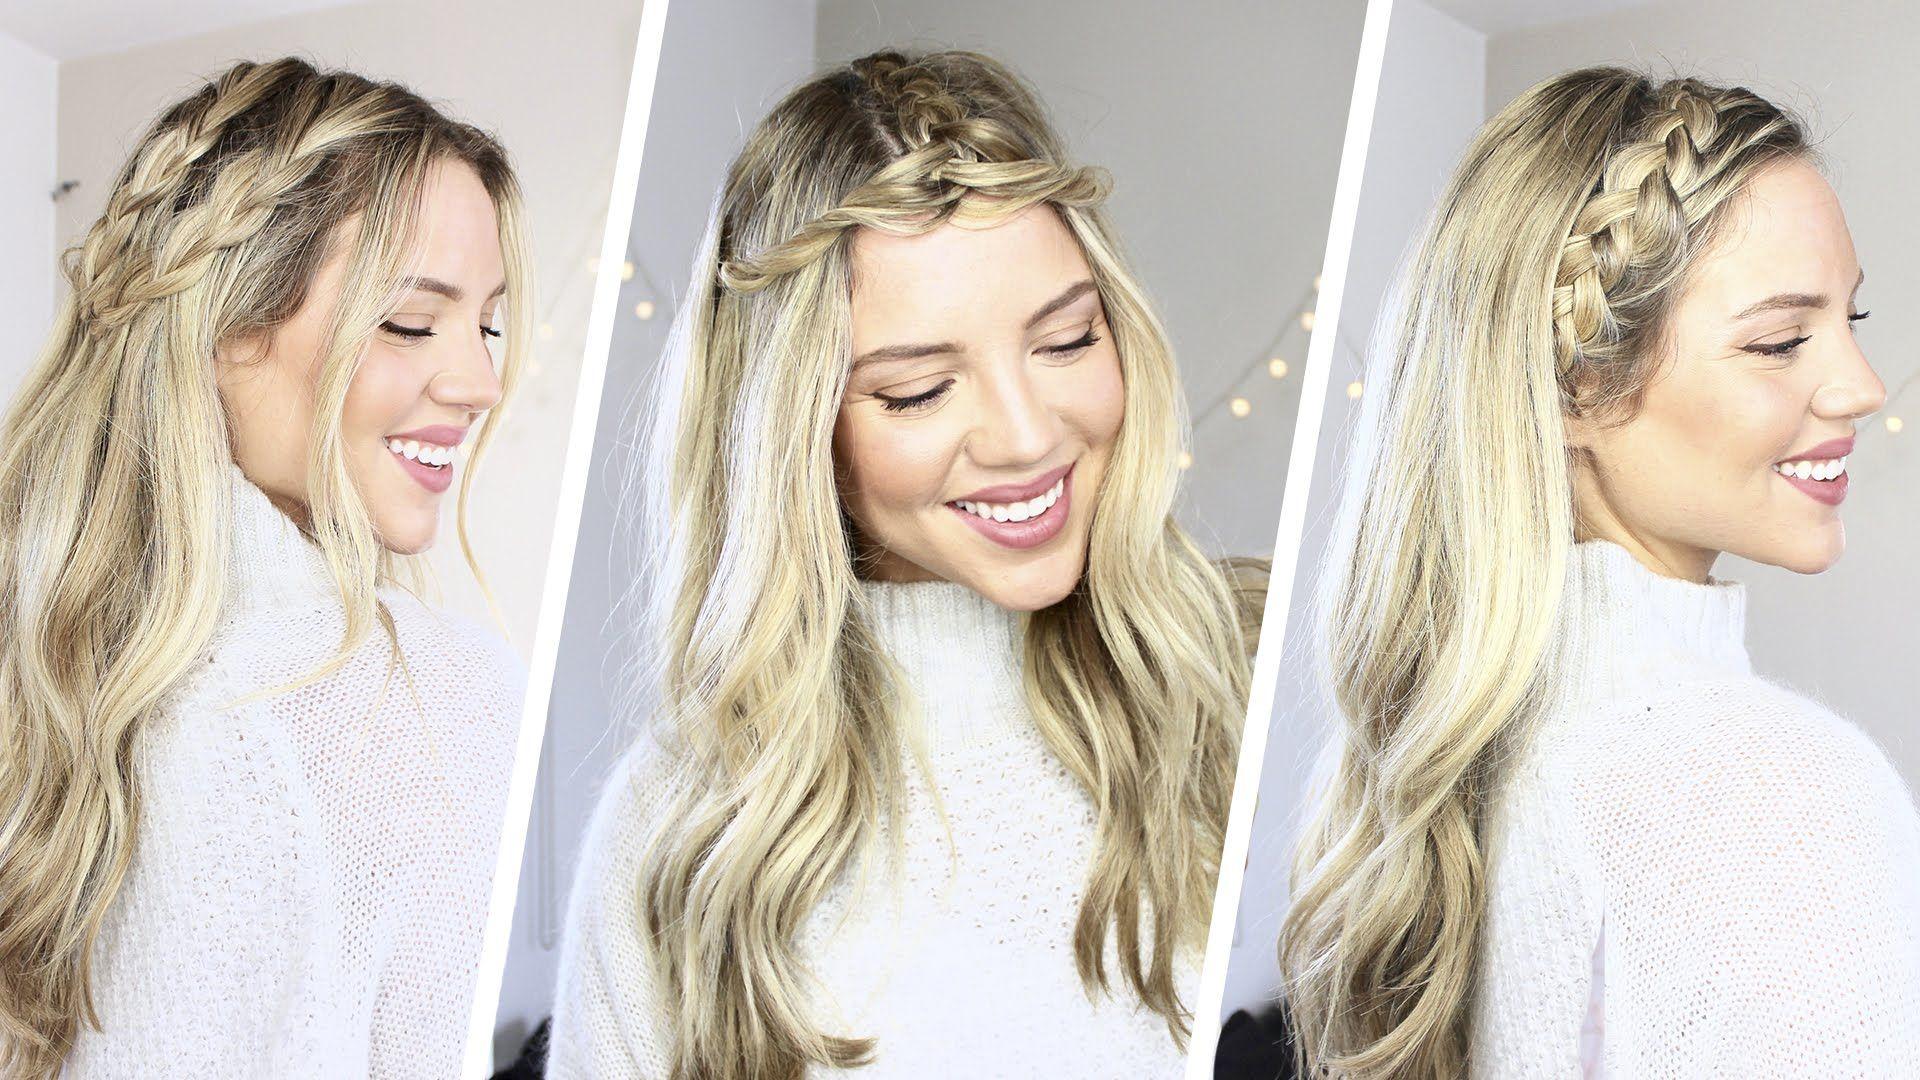 How to 3 Easy Braided Hairstyles Coachella Luxy Hair